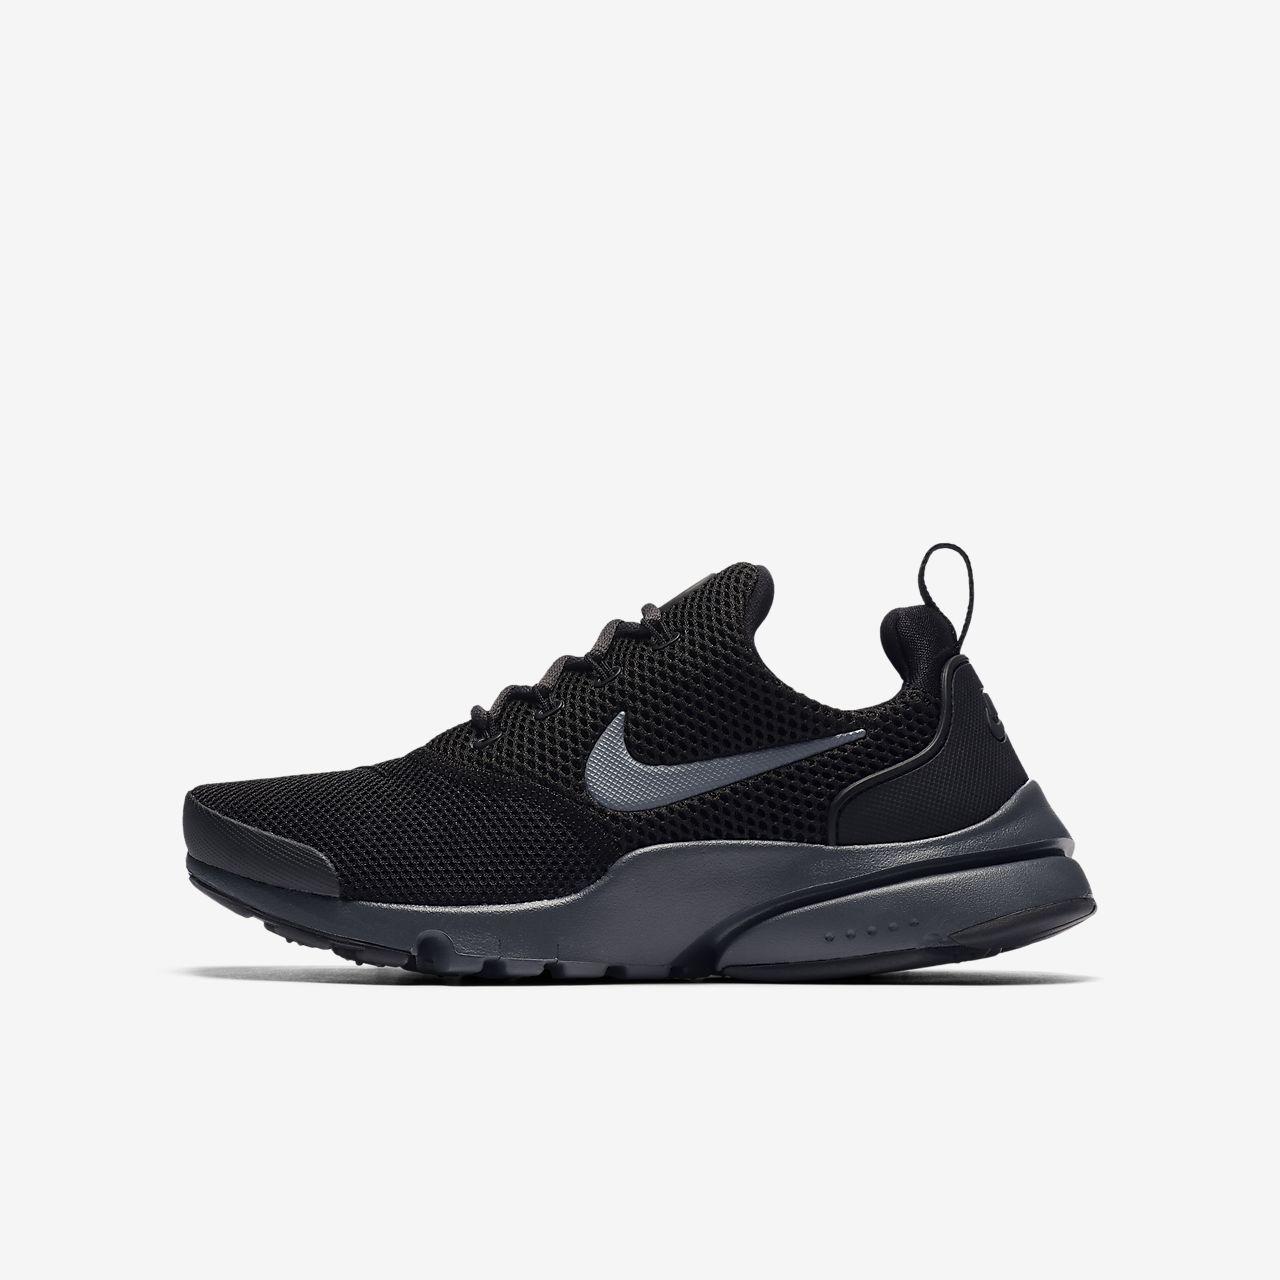 Nike Air Presto Mens Shoe